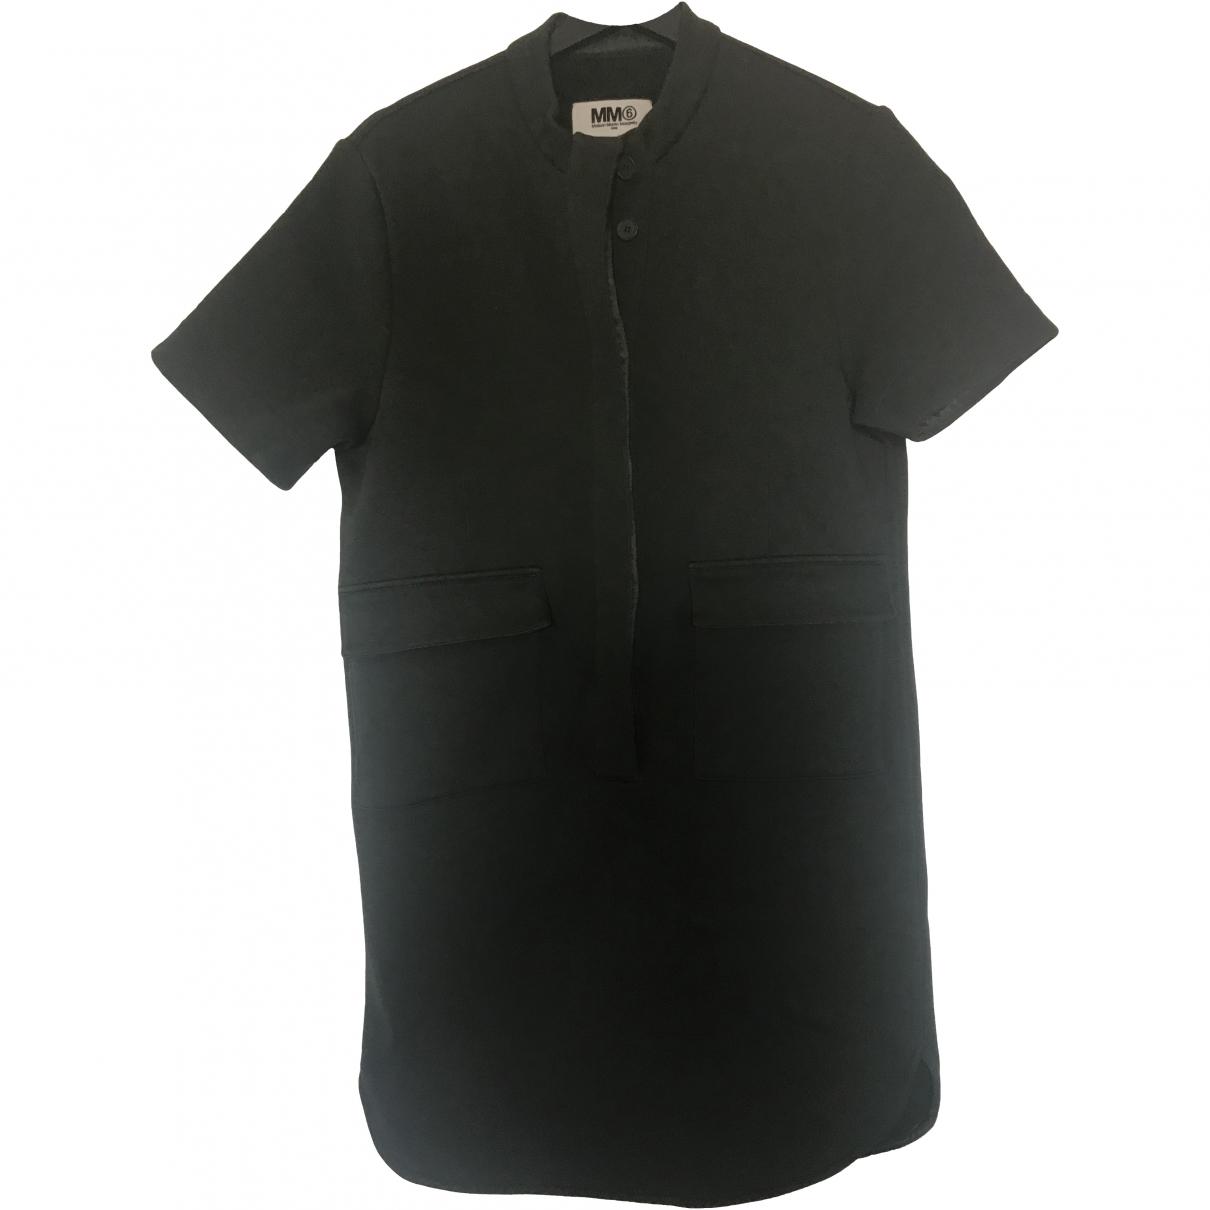 Mm6 \N Khaki Cotton dress for Women M International